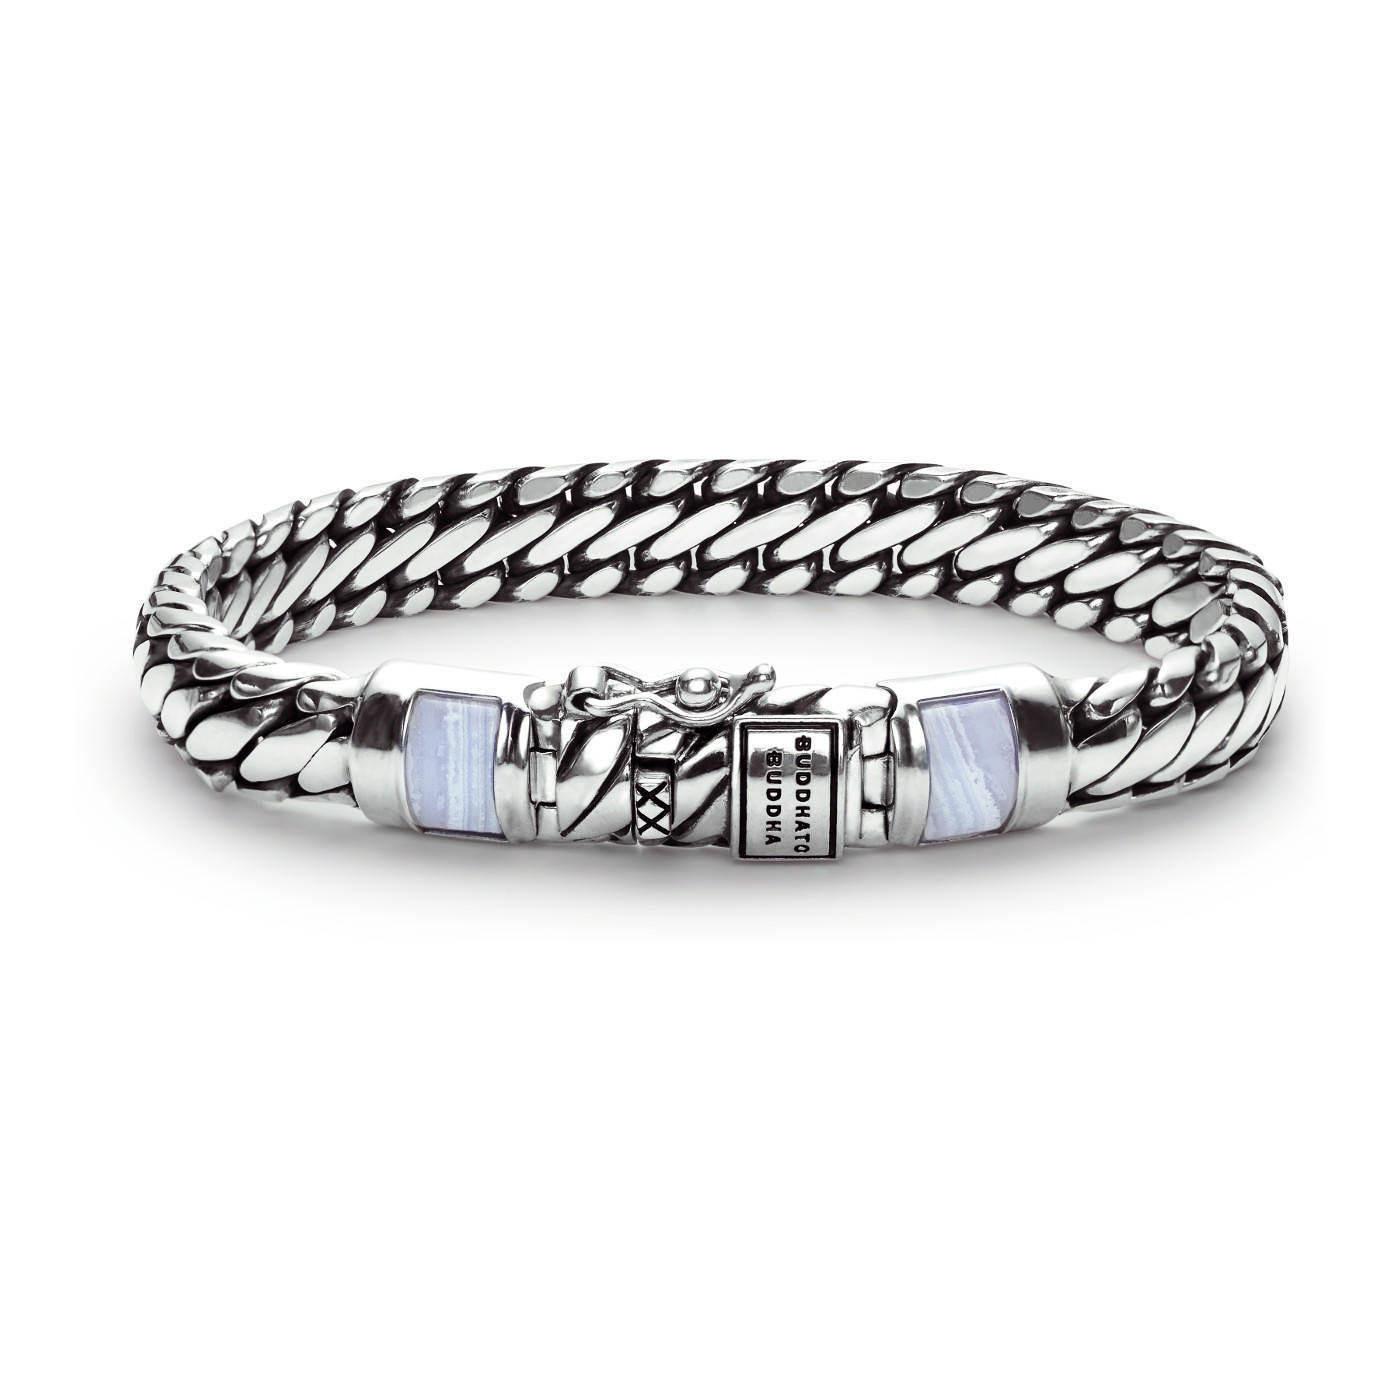 Buddha to Buddha Ben XS Stone Blue Lace Agate Armband J070BA (Lengte: 18-19 cm)